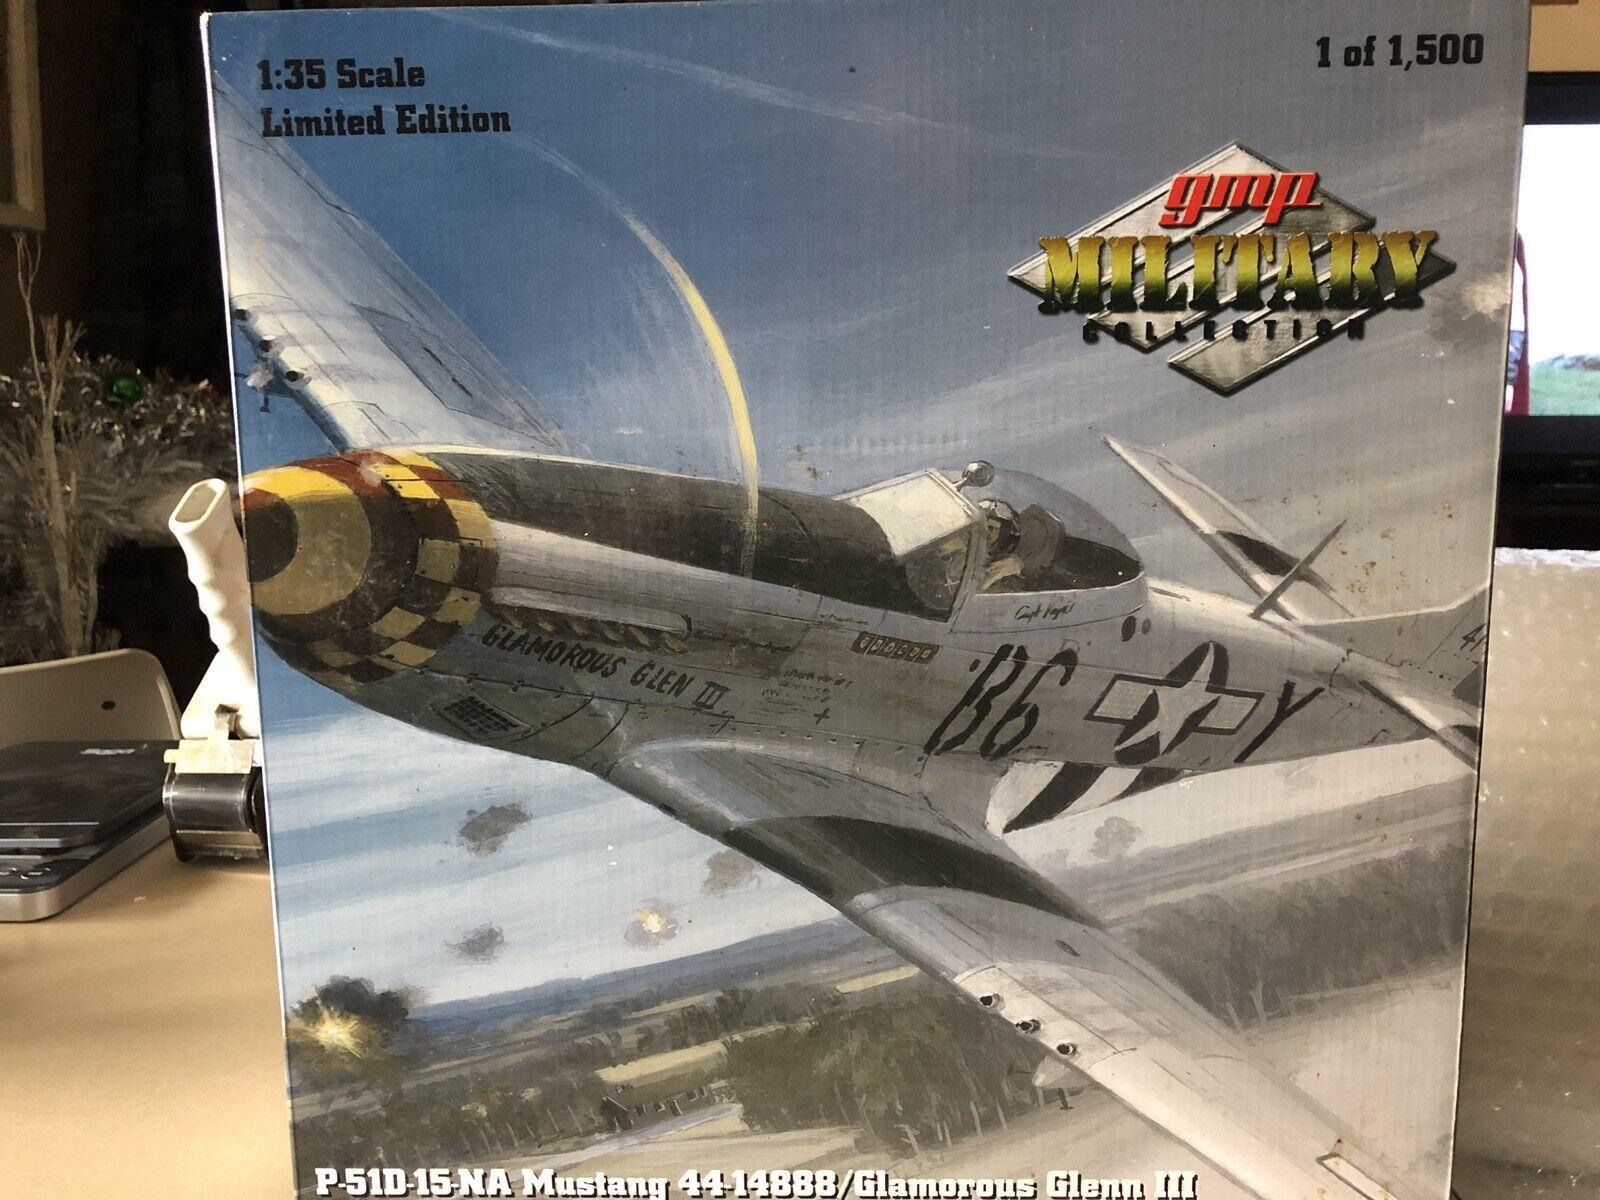 GMP GlamGoldus Glen III P-51D-15-NA MUSTANG